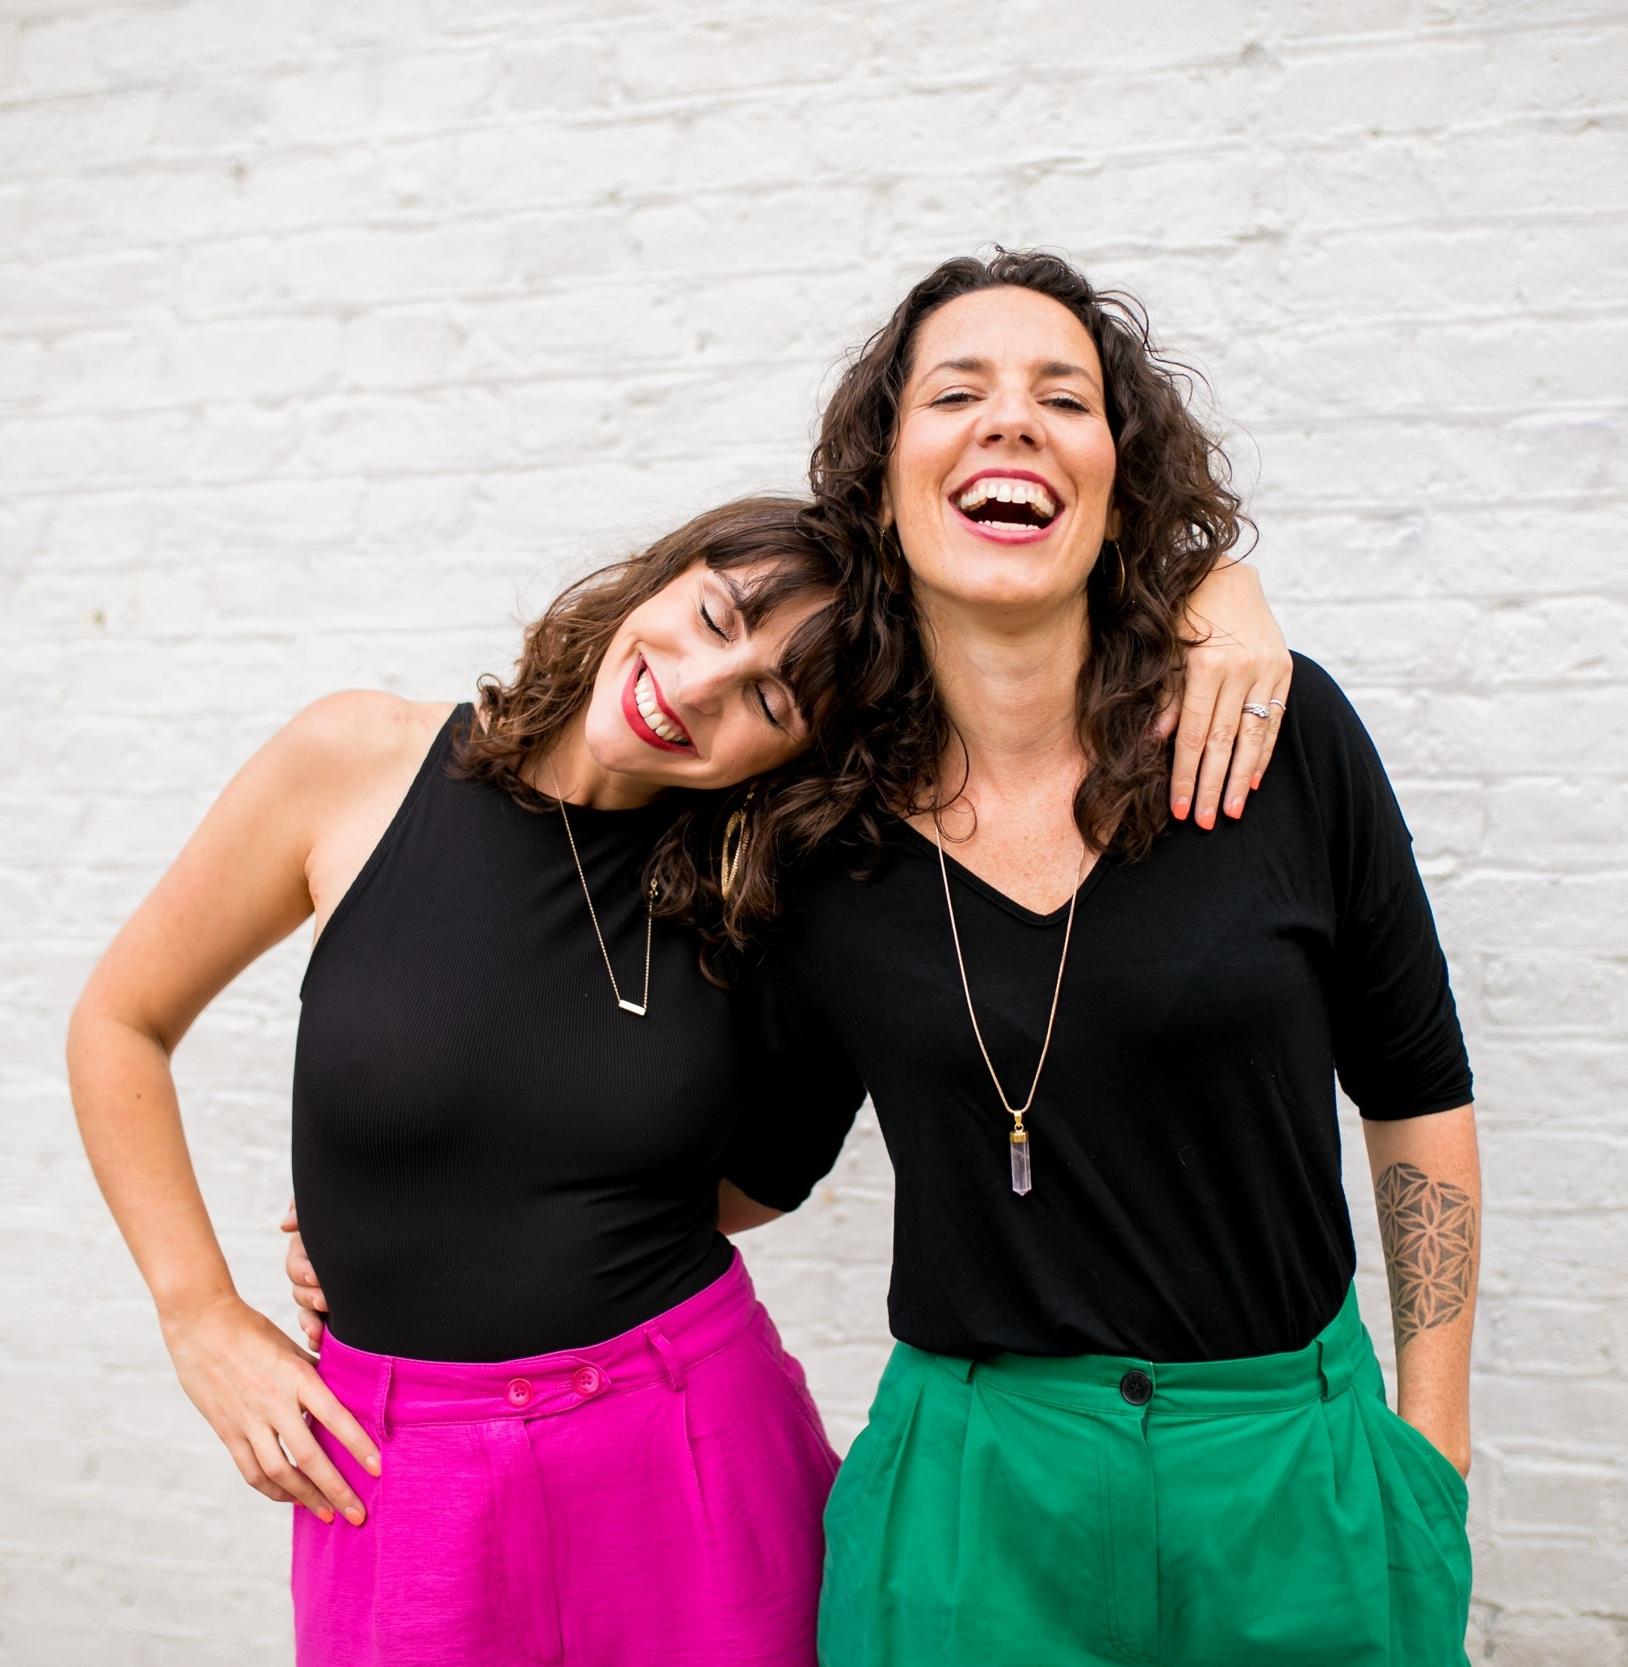 Vicki-Selina-founders-Project-love.jpg